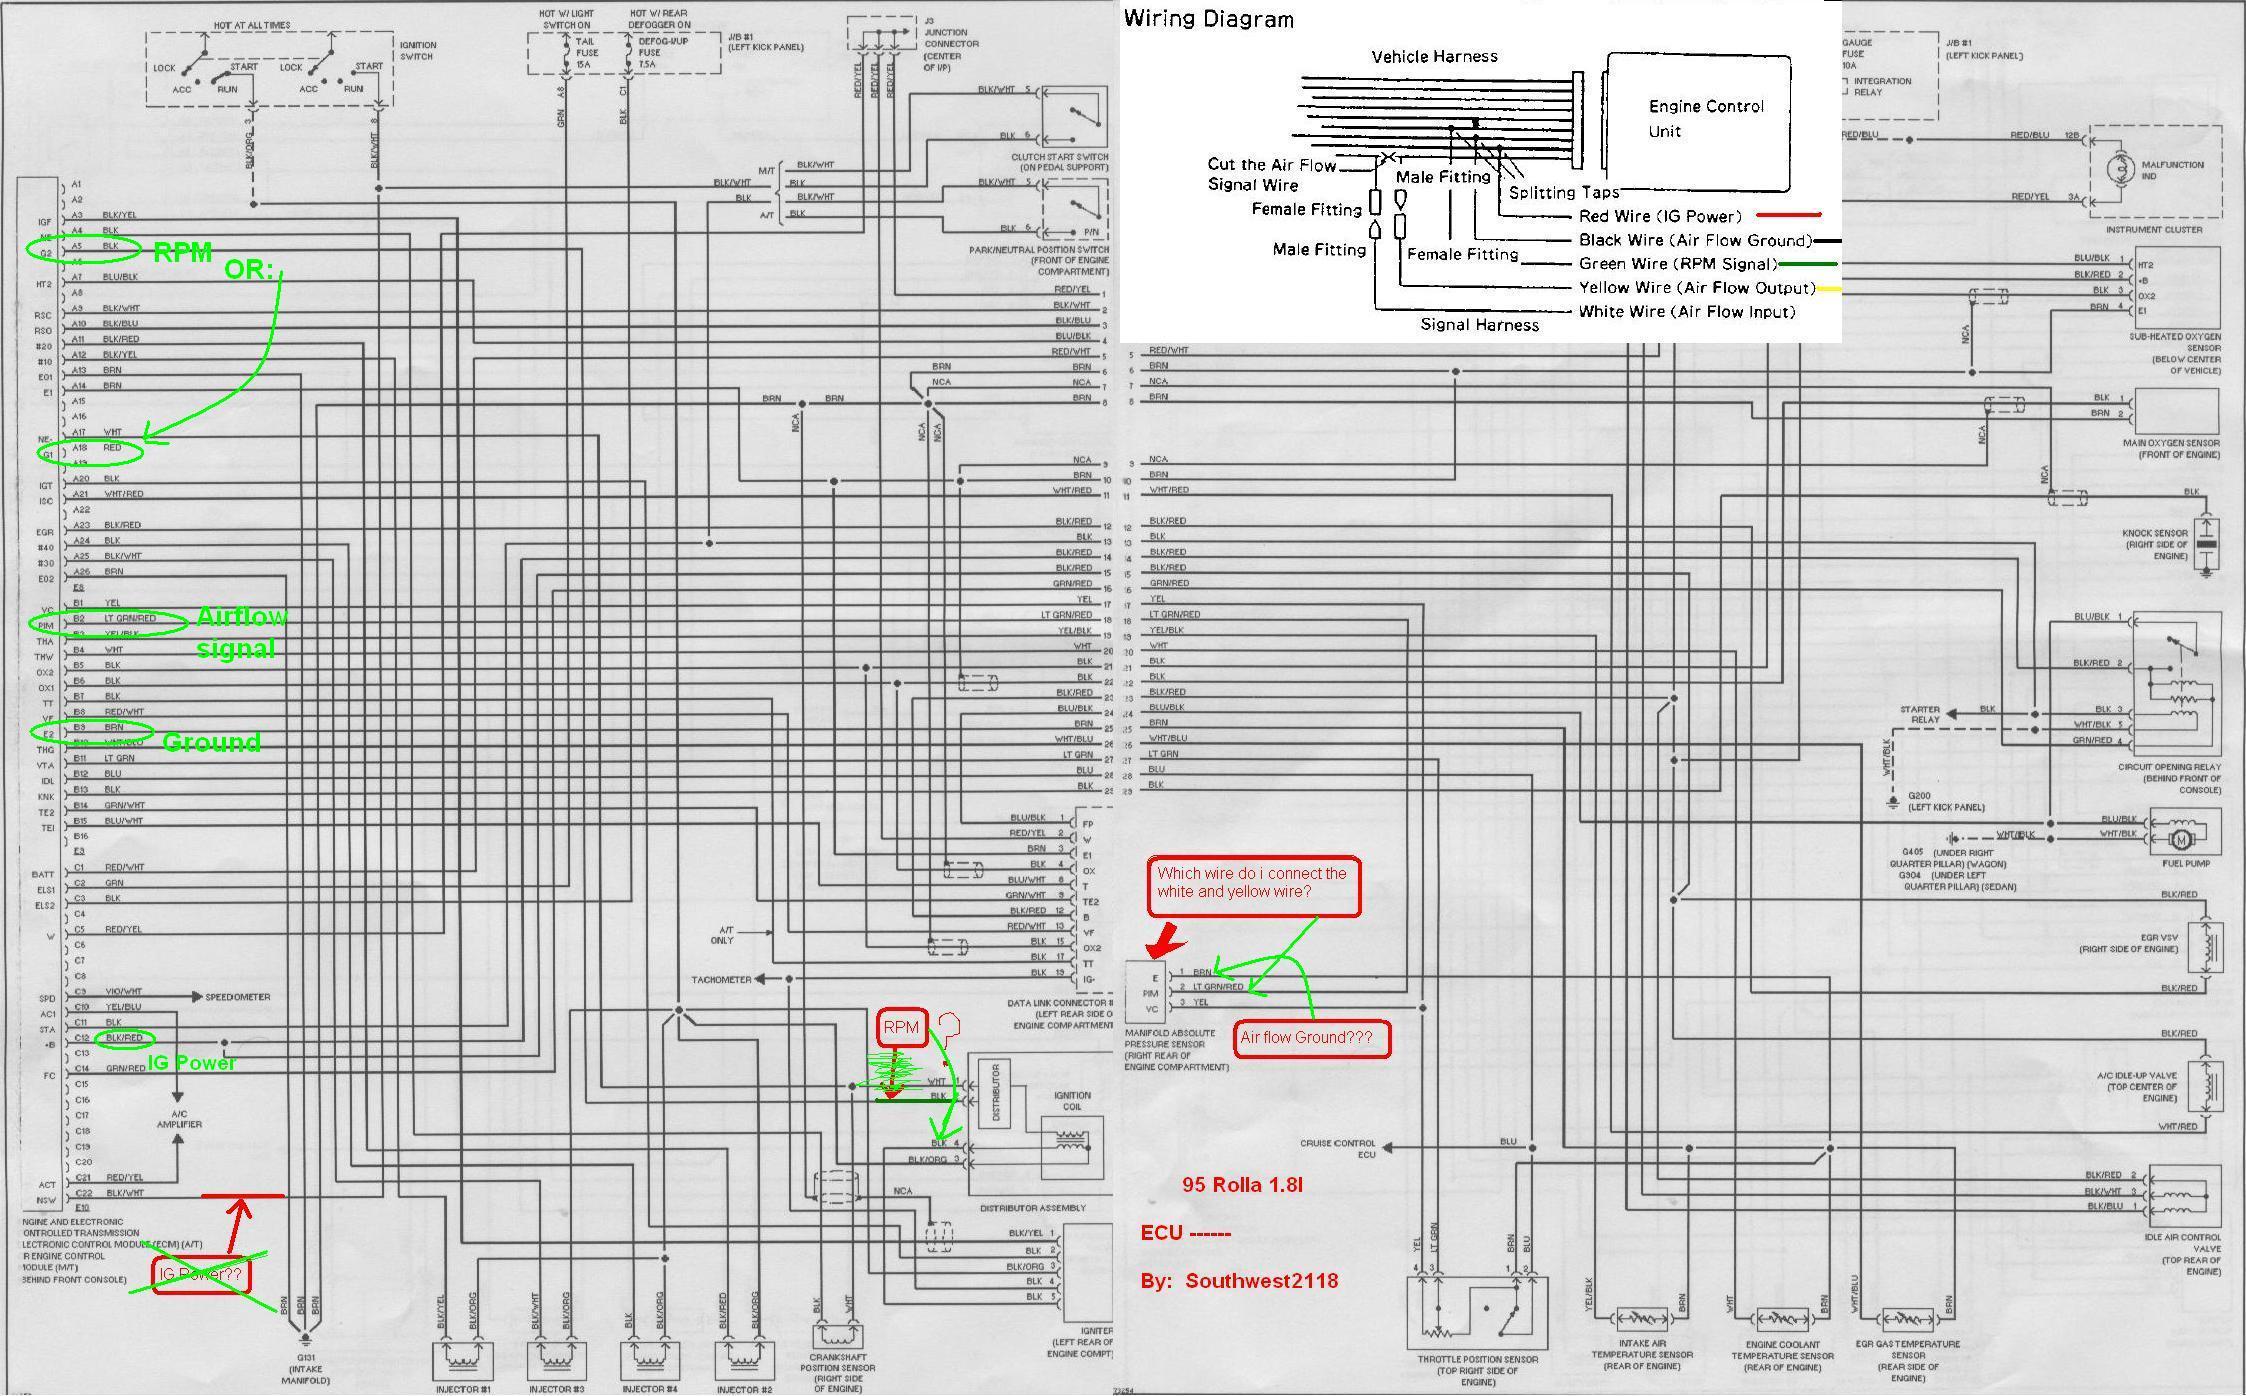 Amazing Apexi Safc Wiring Diagram Sr20de For Pictures Inspiration ...